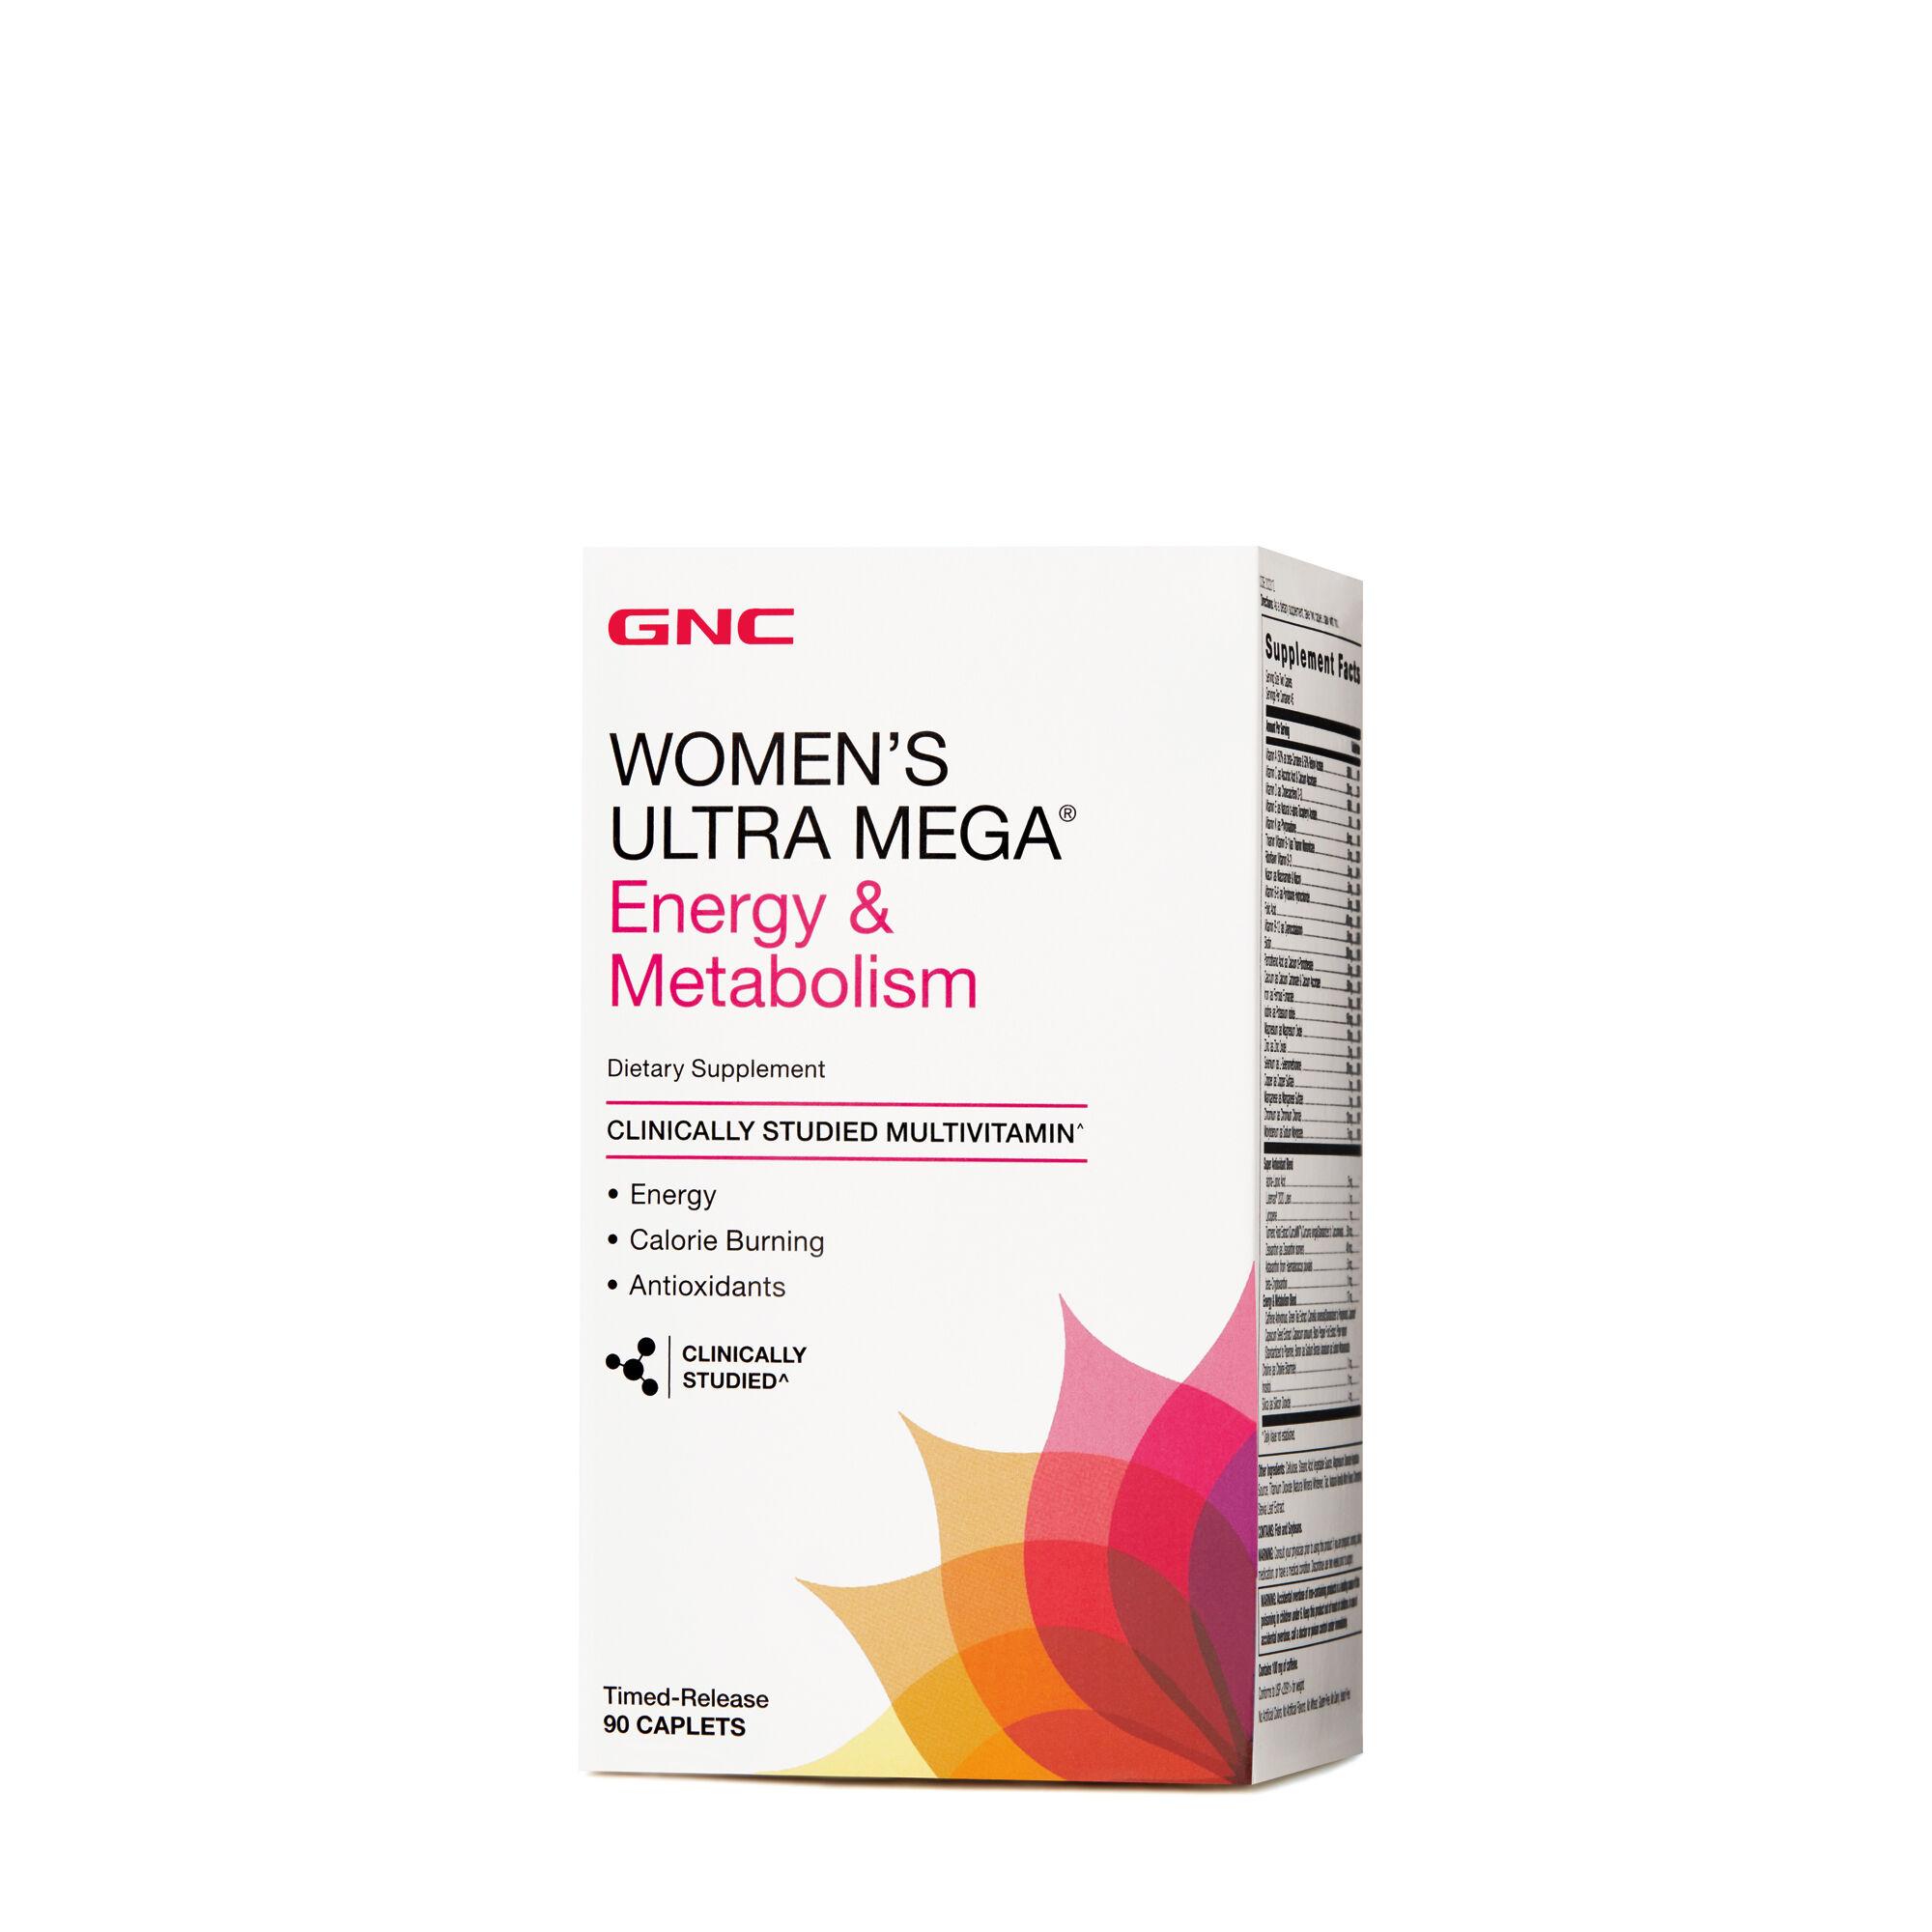 Women's Ultra Mega Energy & Metabolism